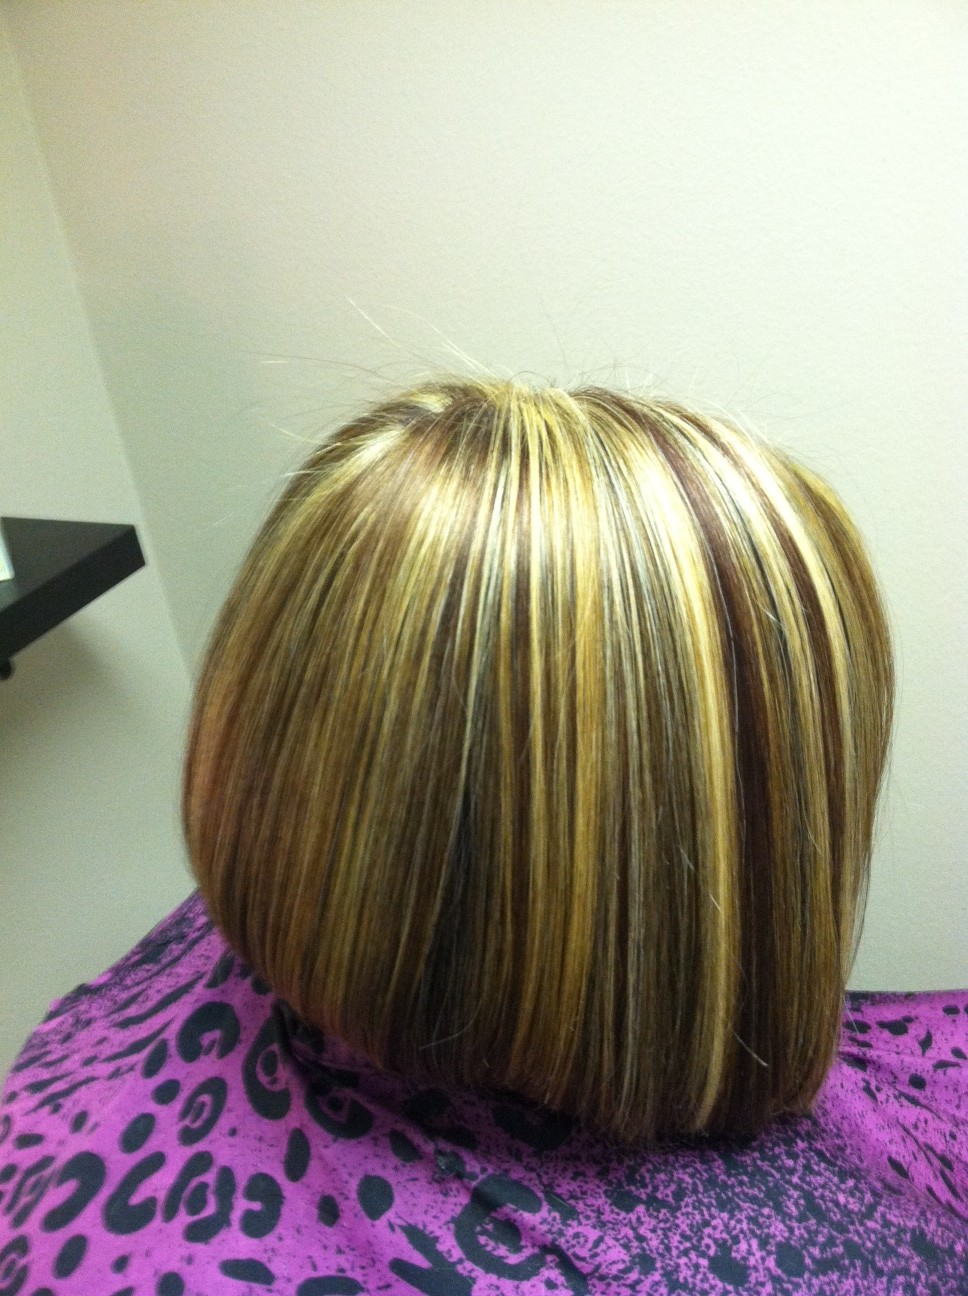 Kelly M Harmsen Owner Of Bossa Nova Hair Amp Art Salon